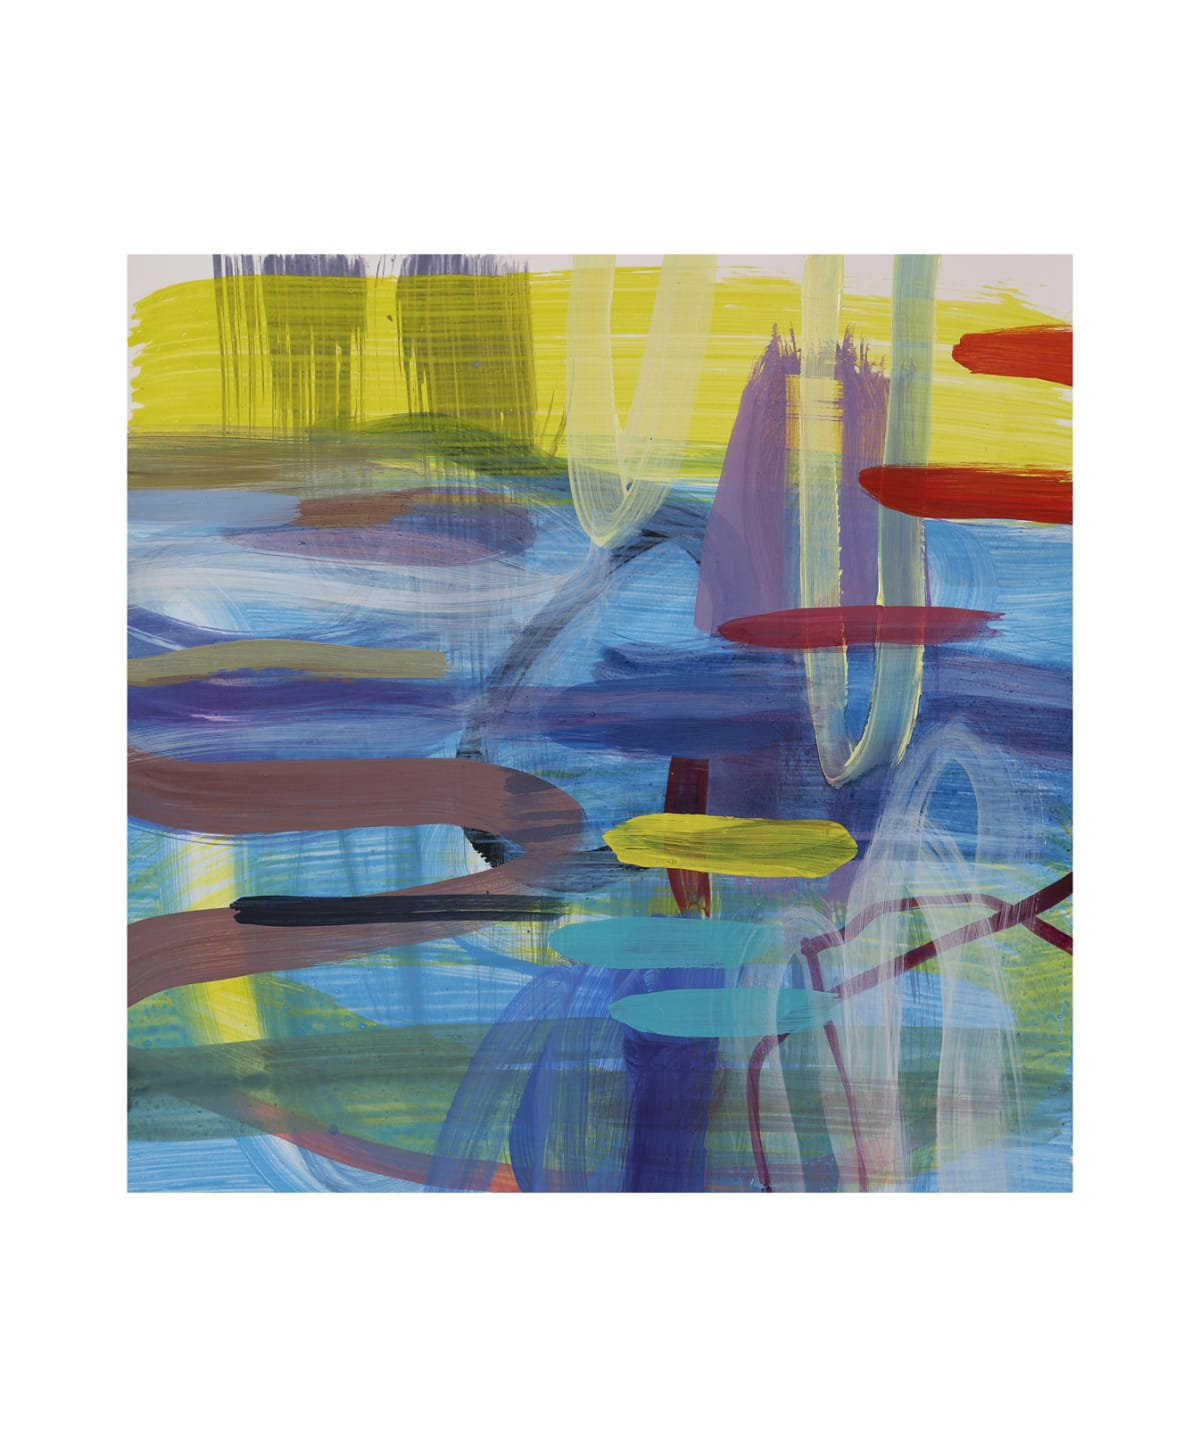 "Ginny Sykes Blues IV Acrylic on paper 12 x 12 unframed, 22.5 x 27.5"" framed"